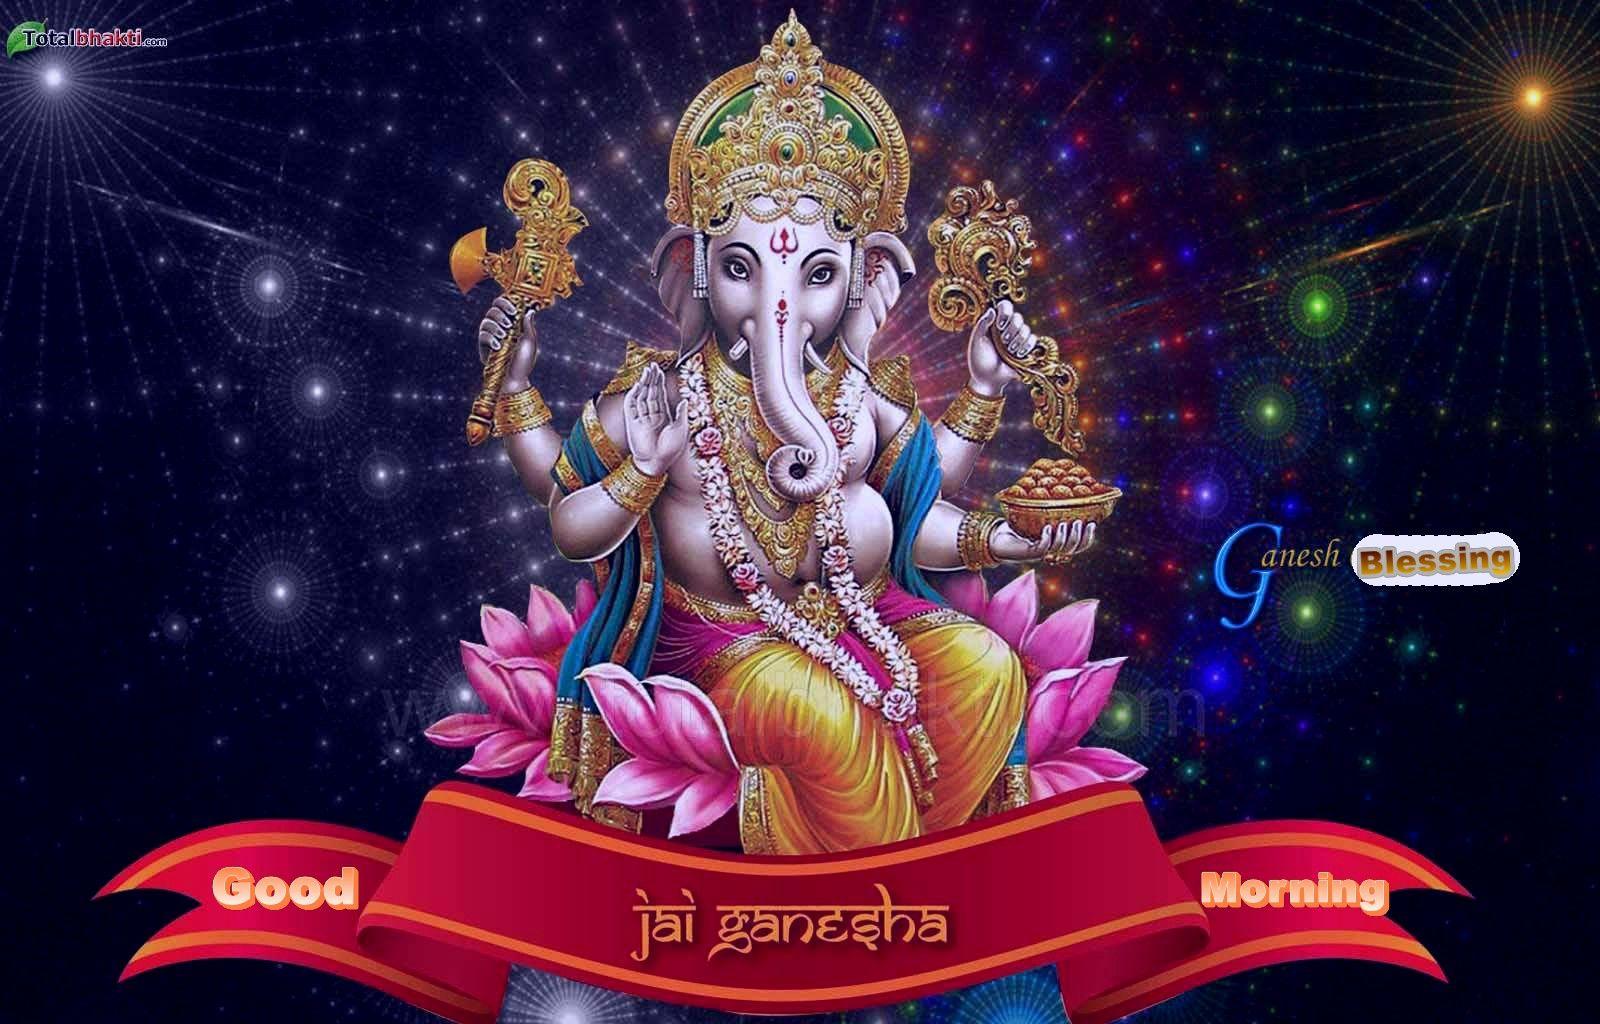 Pin By Suresh Rajani On Good Morning Pinterest Ganesha Ganesh